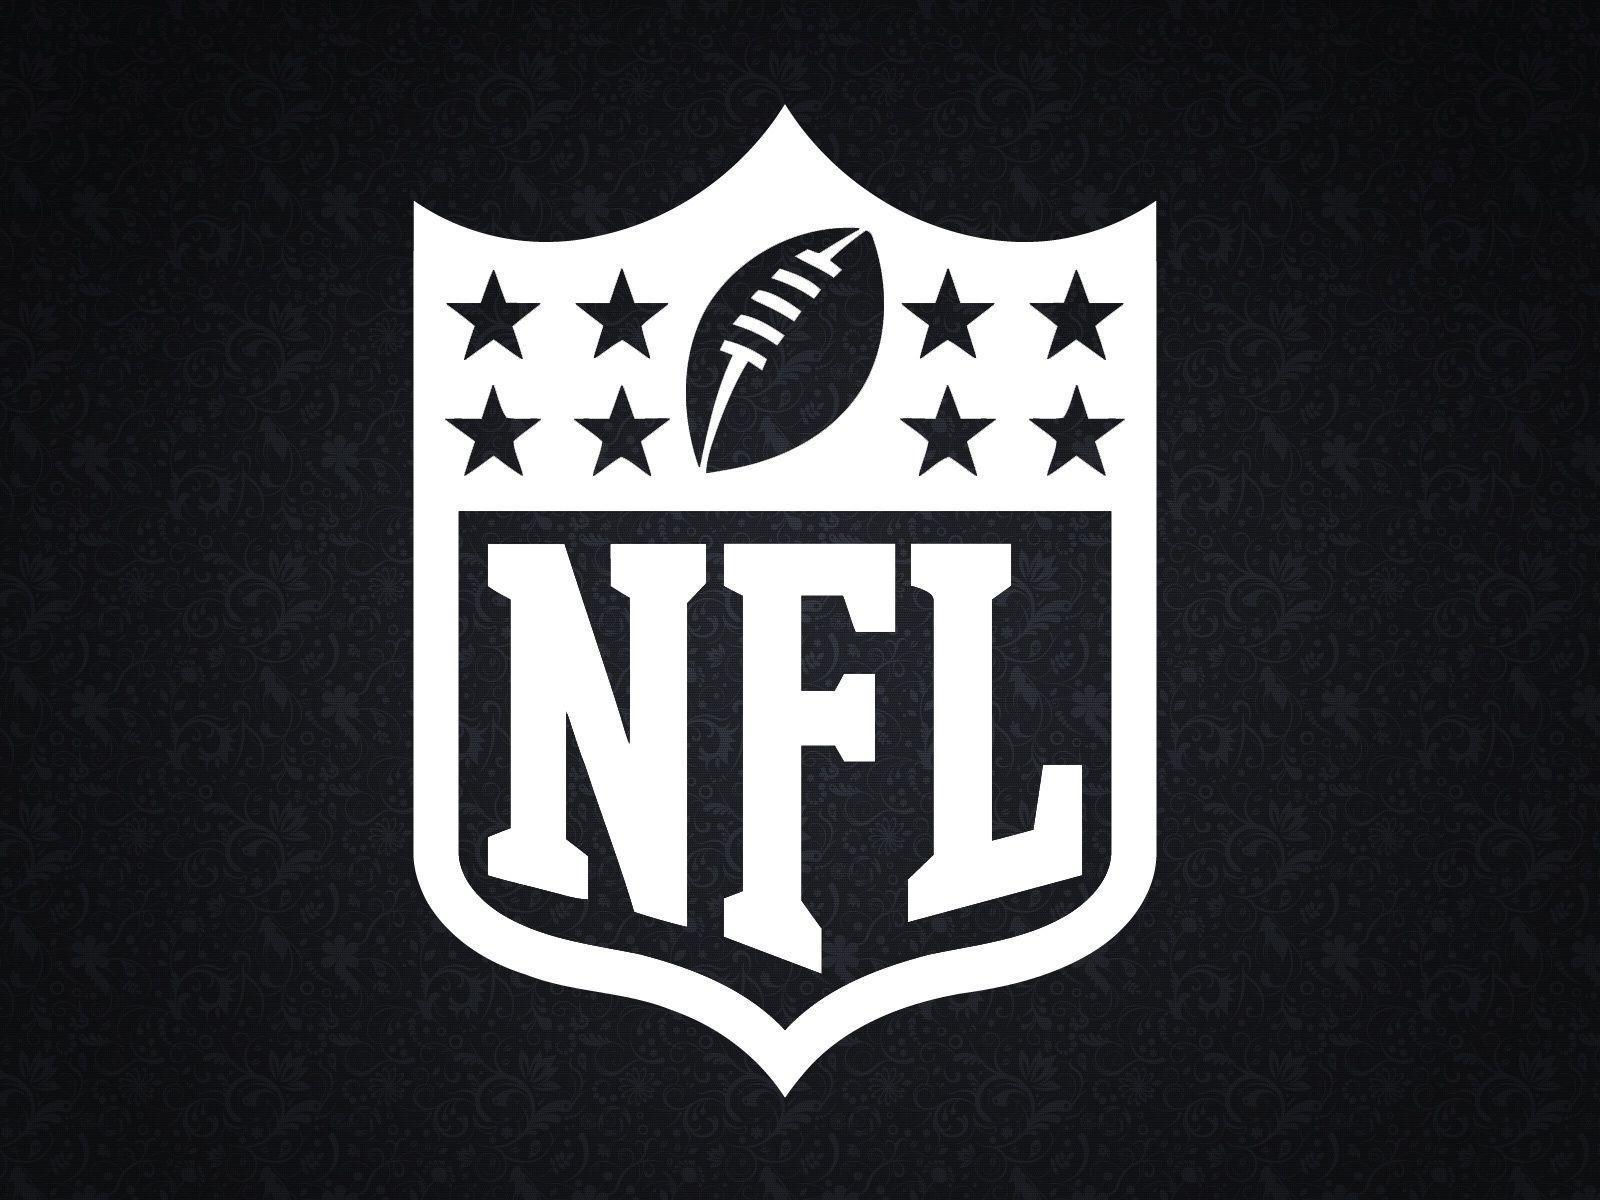 HD Widescreen NFL Wallpapers Archives (44) - SH.VM